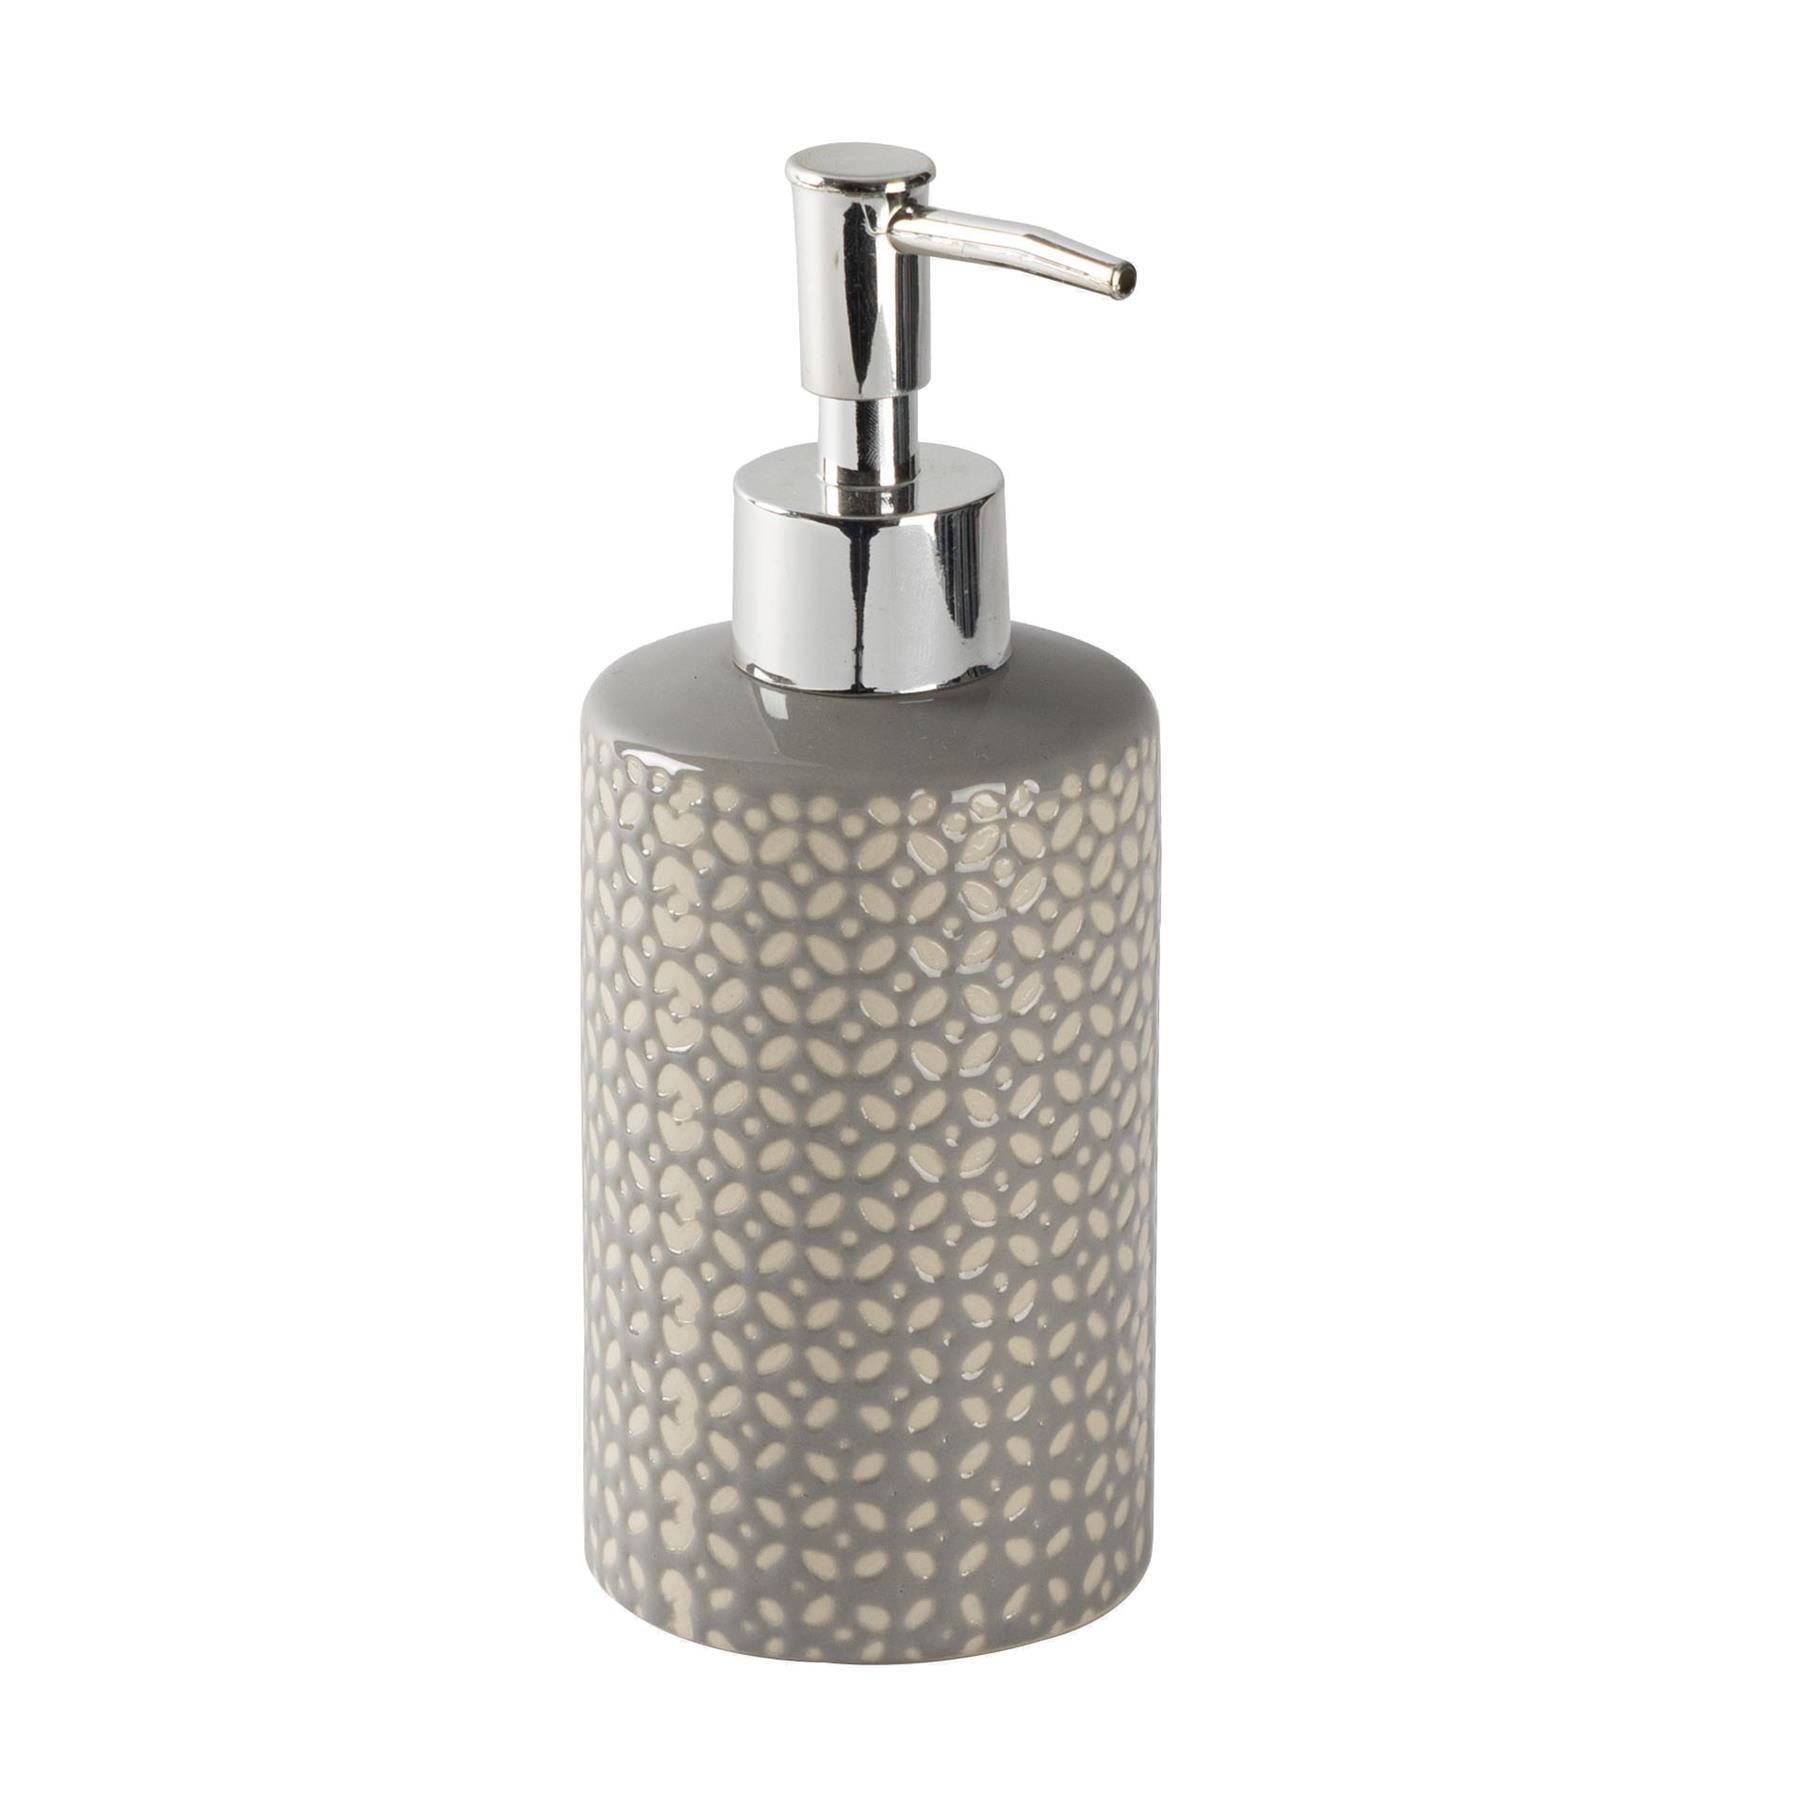 Picture of: Liquid Soap Dispenser Kitchen Bathroom Pump Bottle Ceramic Grey Ebay